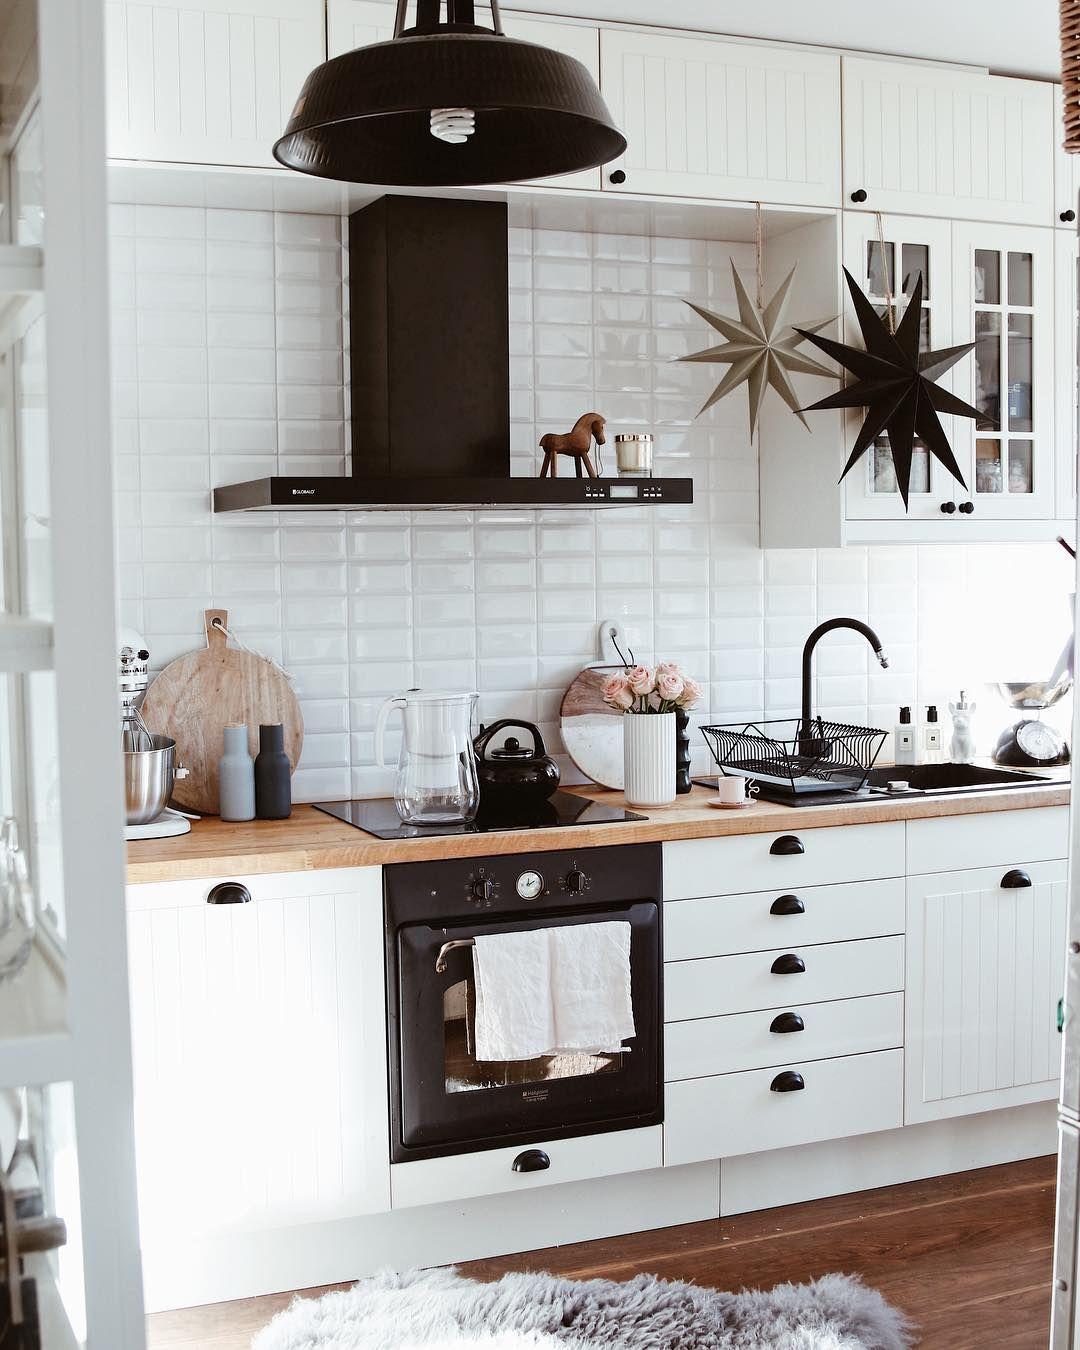 Modern minimal white kitchen with black appliances, black